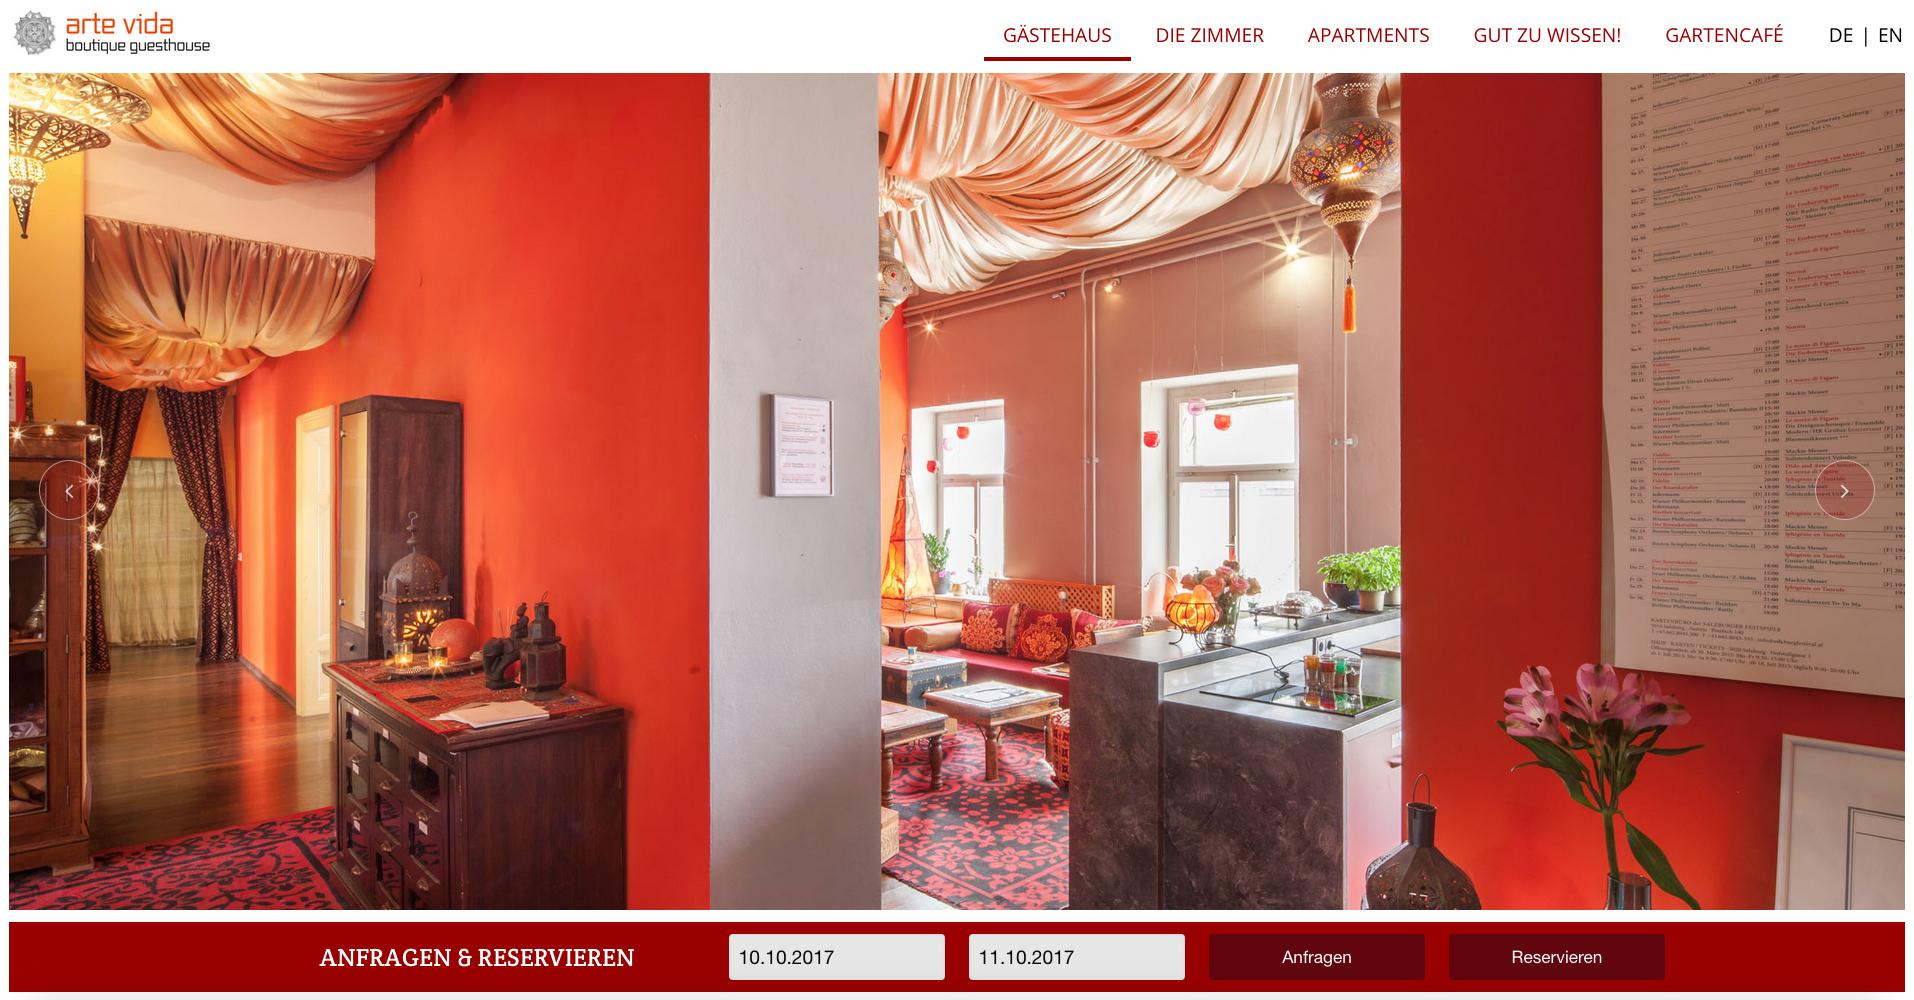 Fresh Herbs Communications Marketing Projektmanagement Website Salzburg_35_arte vida boutique guesthouse